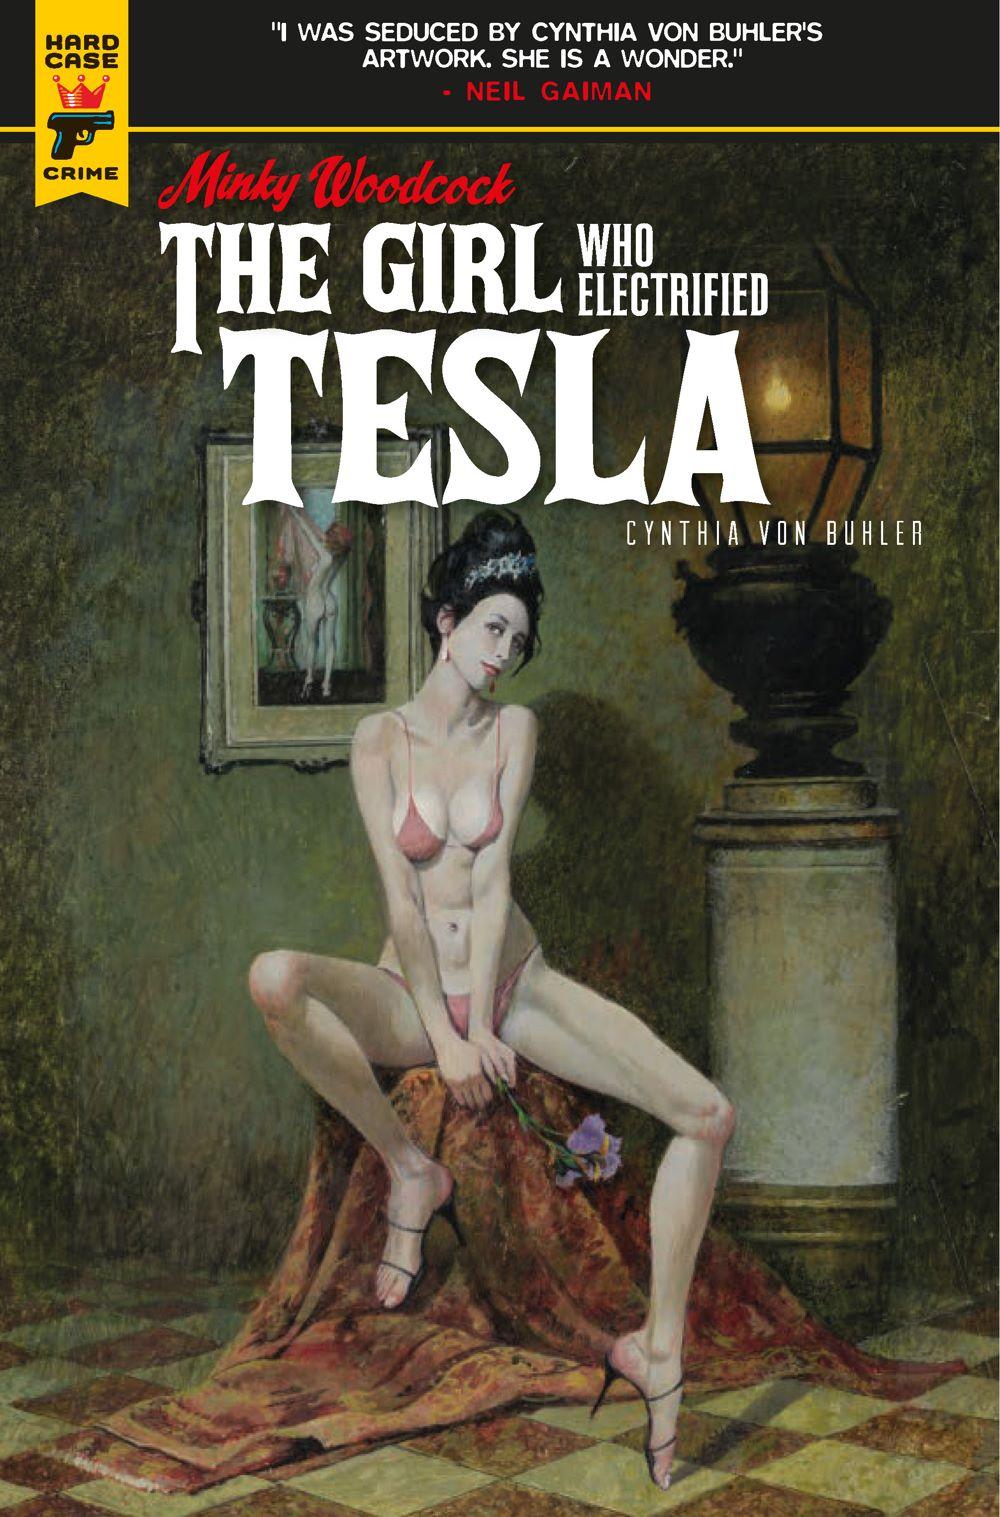 Minky-Woodcock-Cover-A-Robert-McGinnis ComicList Previews: MINKY WOODCOCK THE GIRL WHO ELECTRIFIED TESLA #1